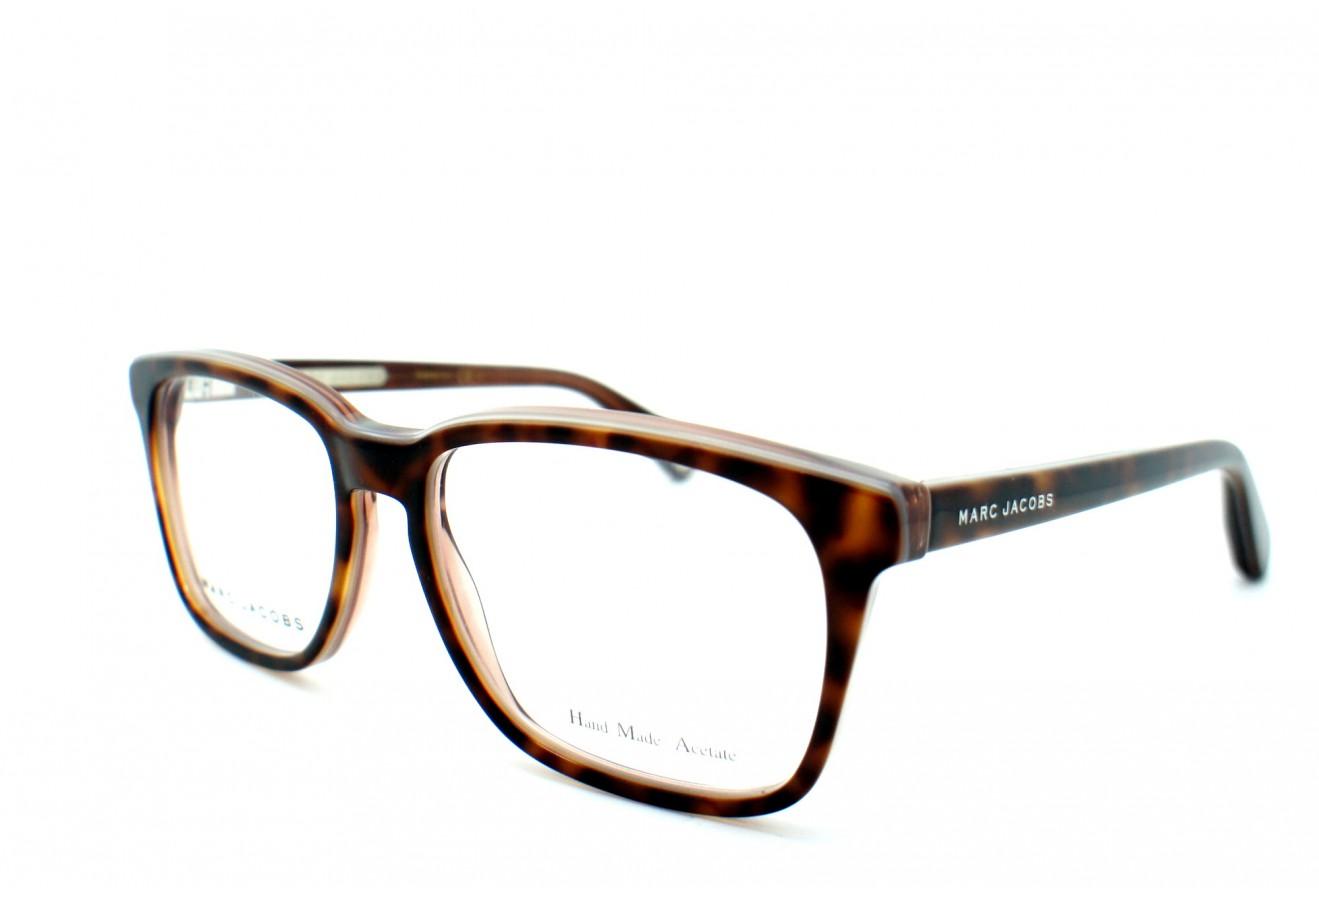 lunettes de vue marc jacobs mj 479 cq6 50 17. Black Bedroom Furniture Sets. Home Design Ideas